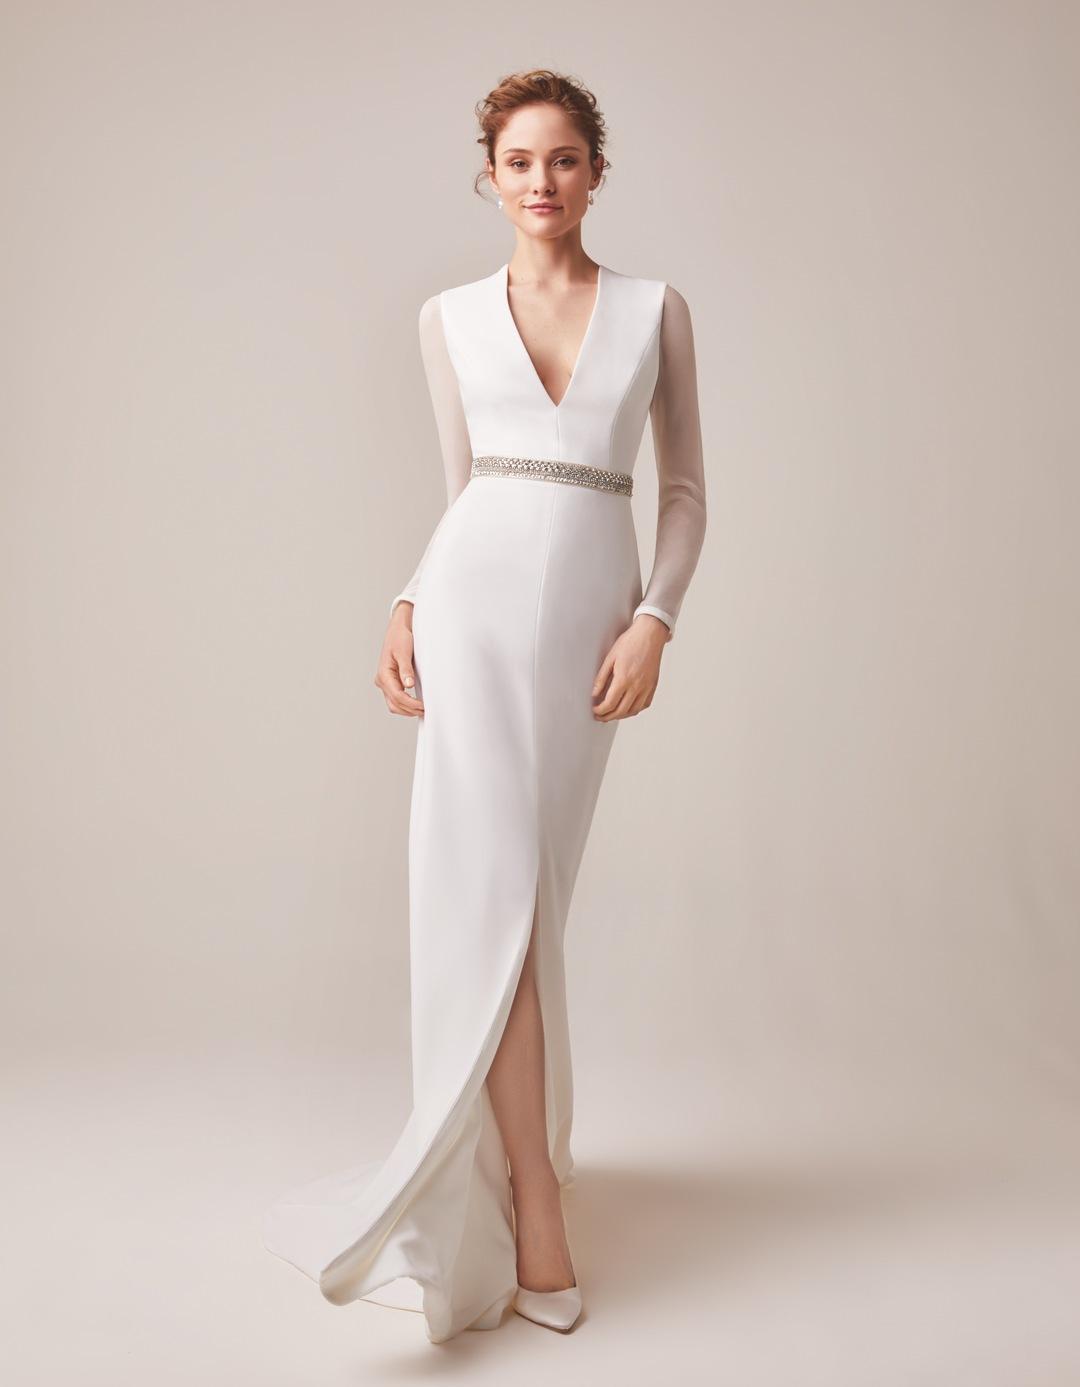 158 dress photo